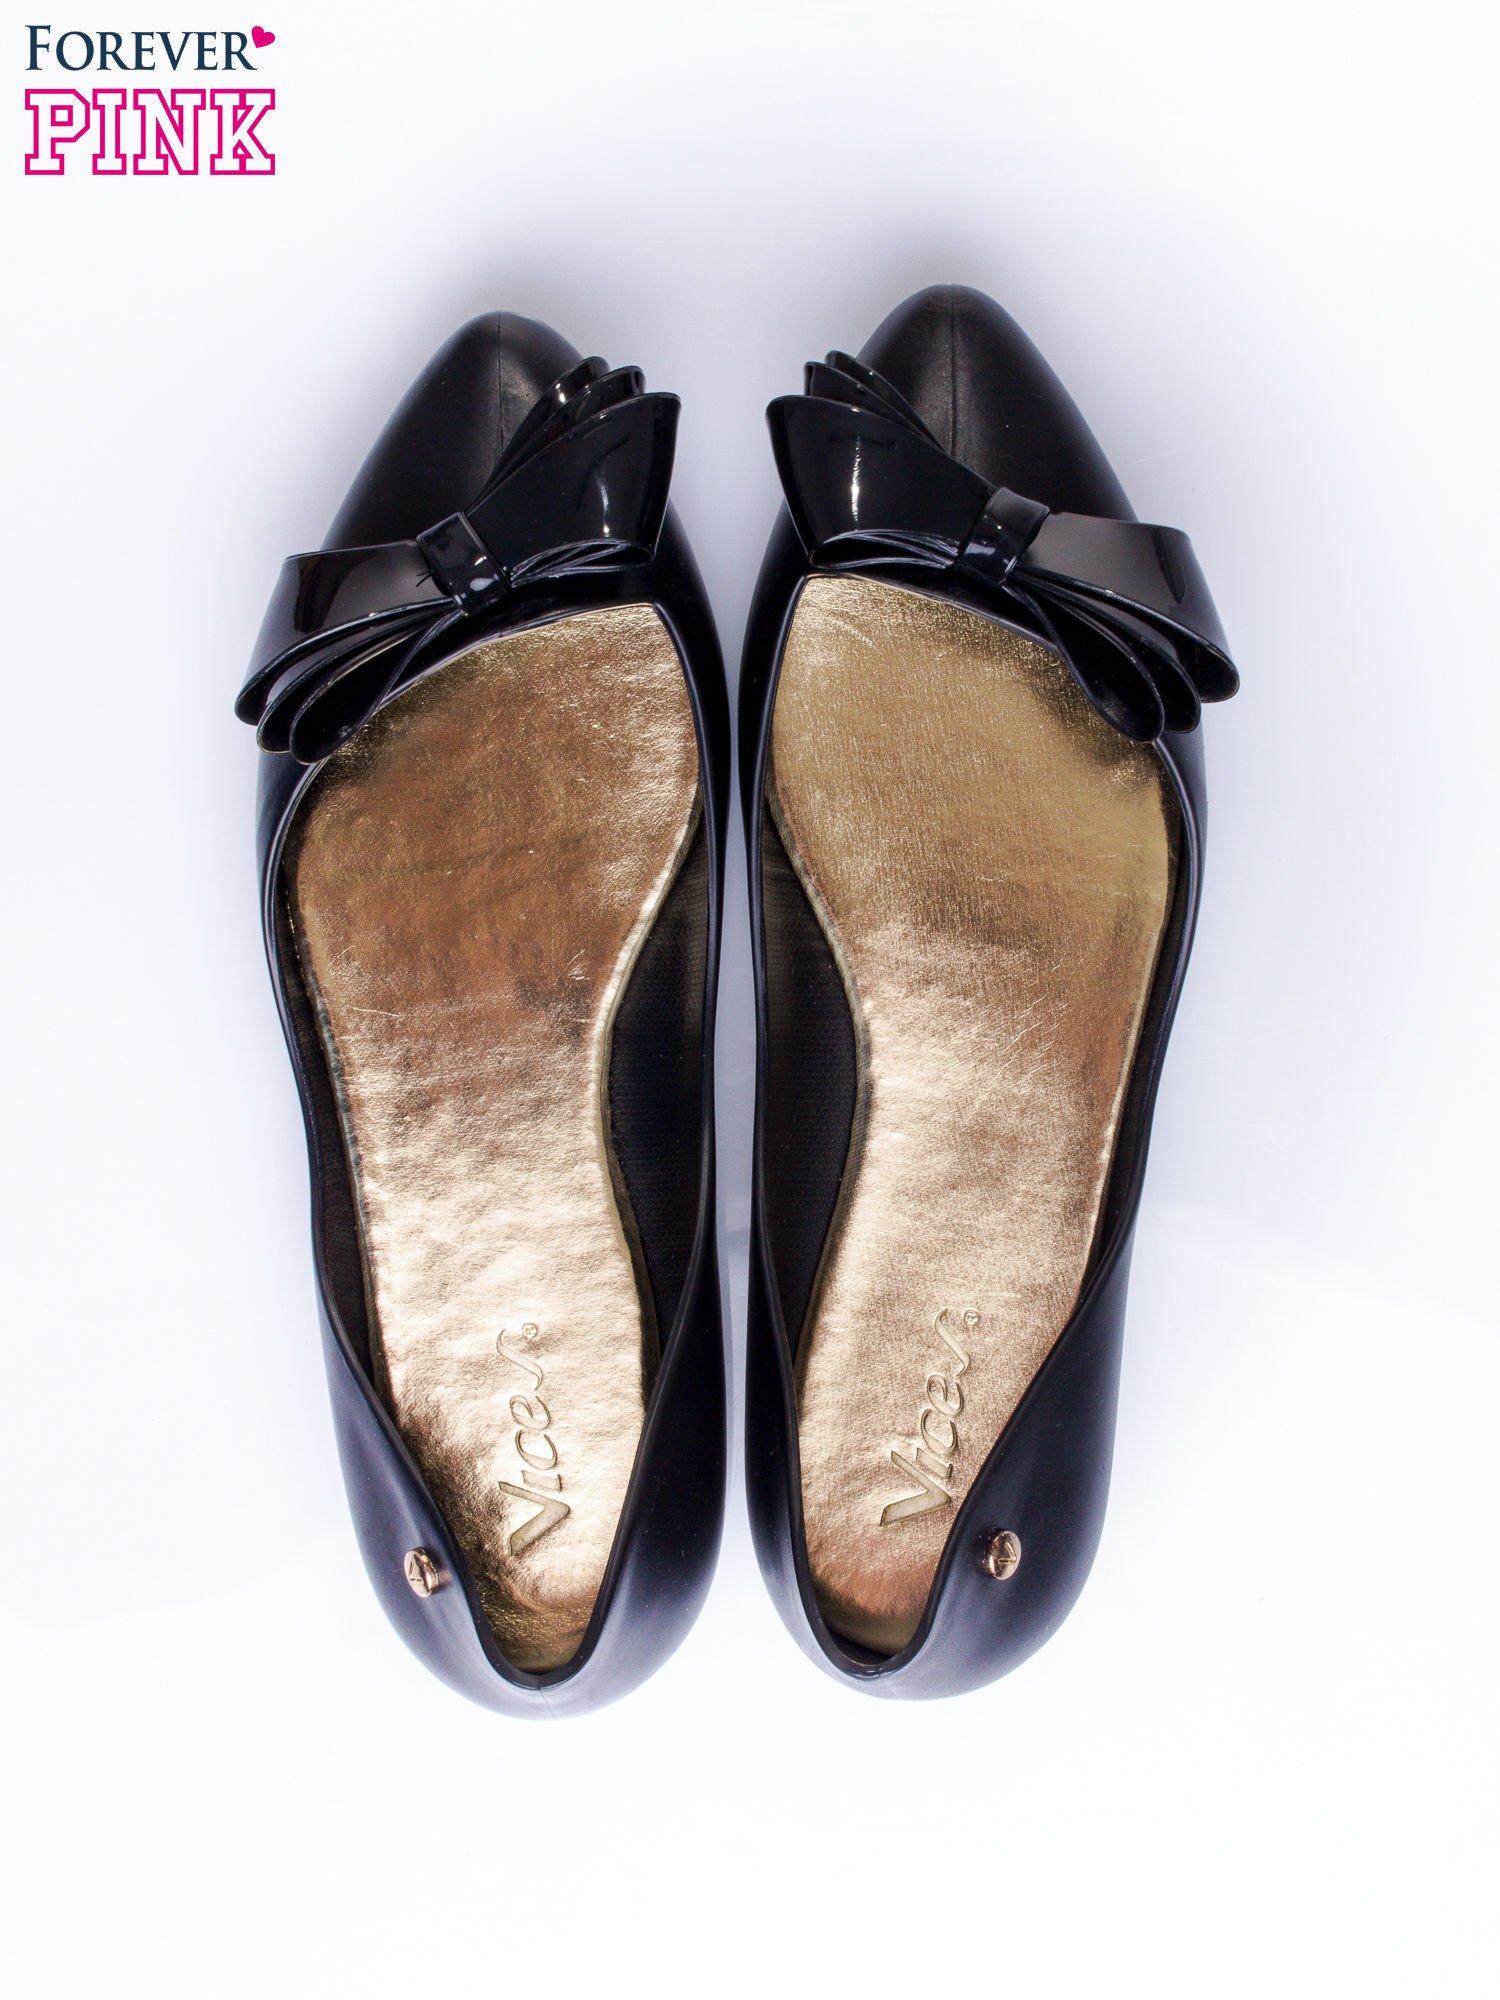 Czarne baleriny silicone Naomi gumowe z kokardą                                  zdj.                                  6